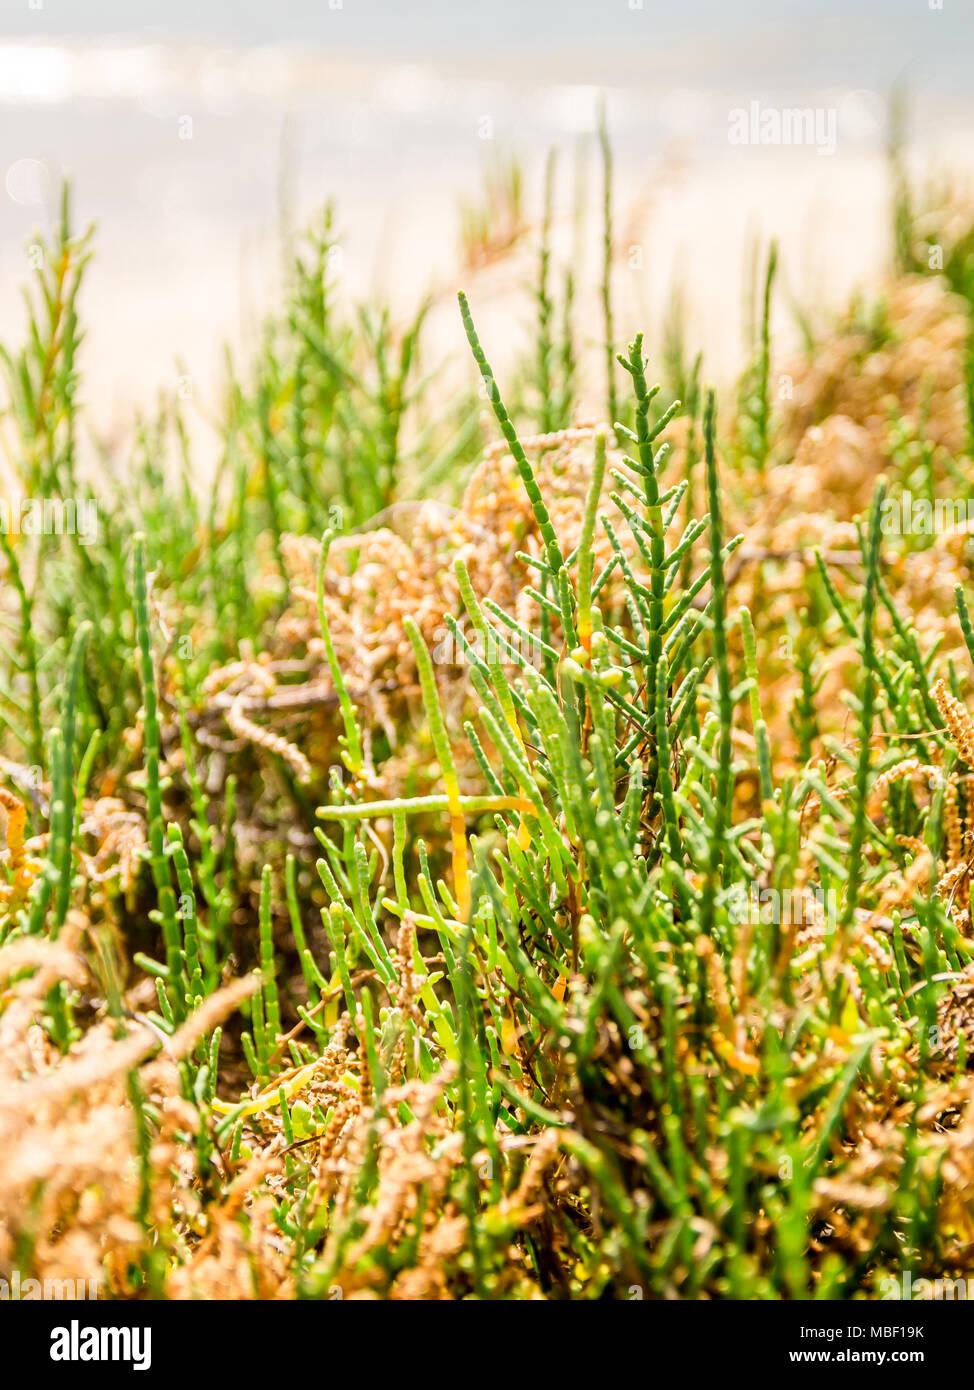 Salicornia or marsh samphire, a culinary delicacy growing in Fuseta, Ria Formosa, Portugal - Stock Image